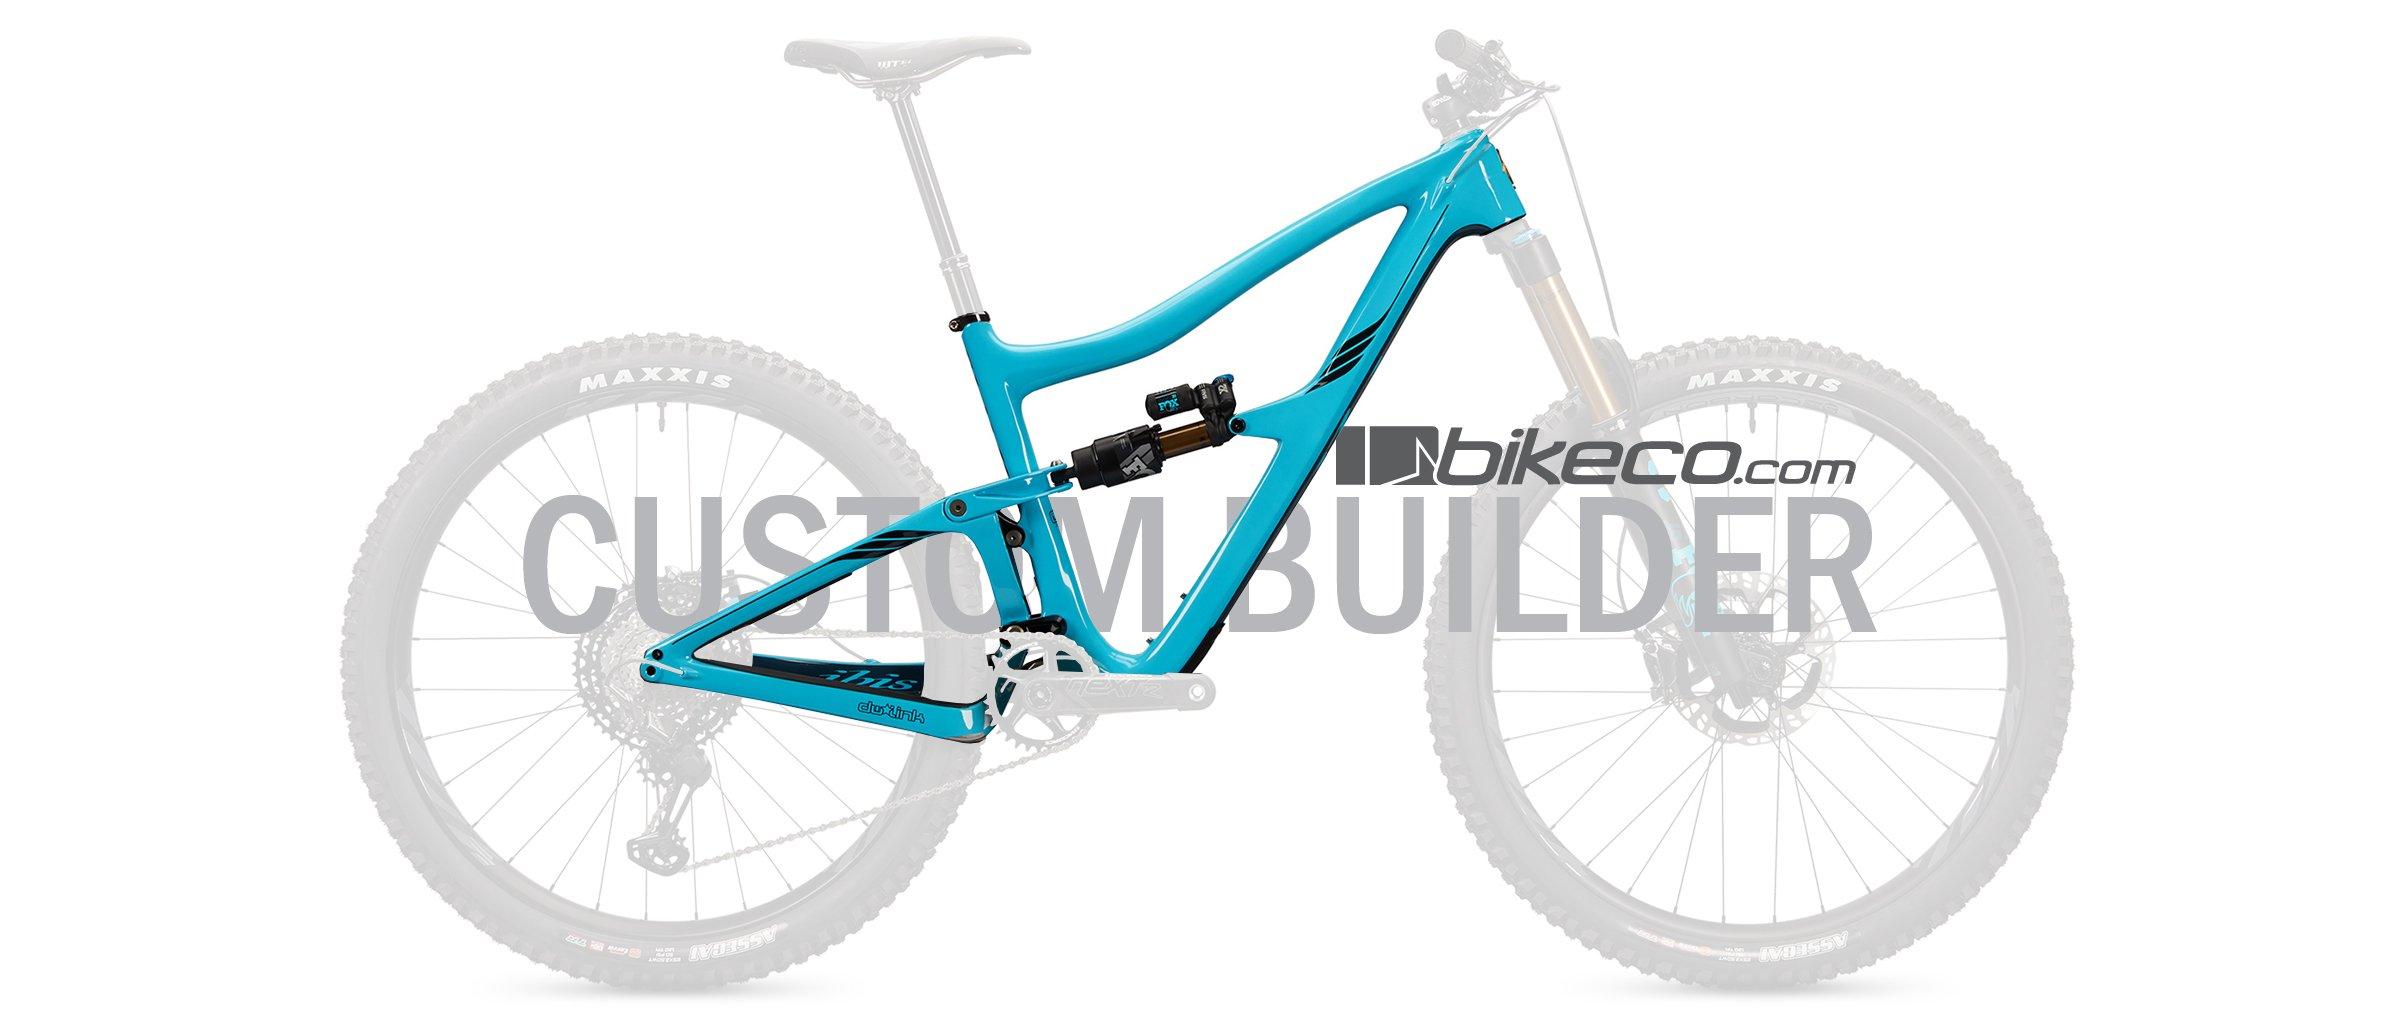 Ibis Ripmo V2 Custom Complete Builder Image. Blue Ripmo with transparent components